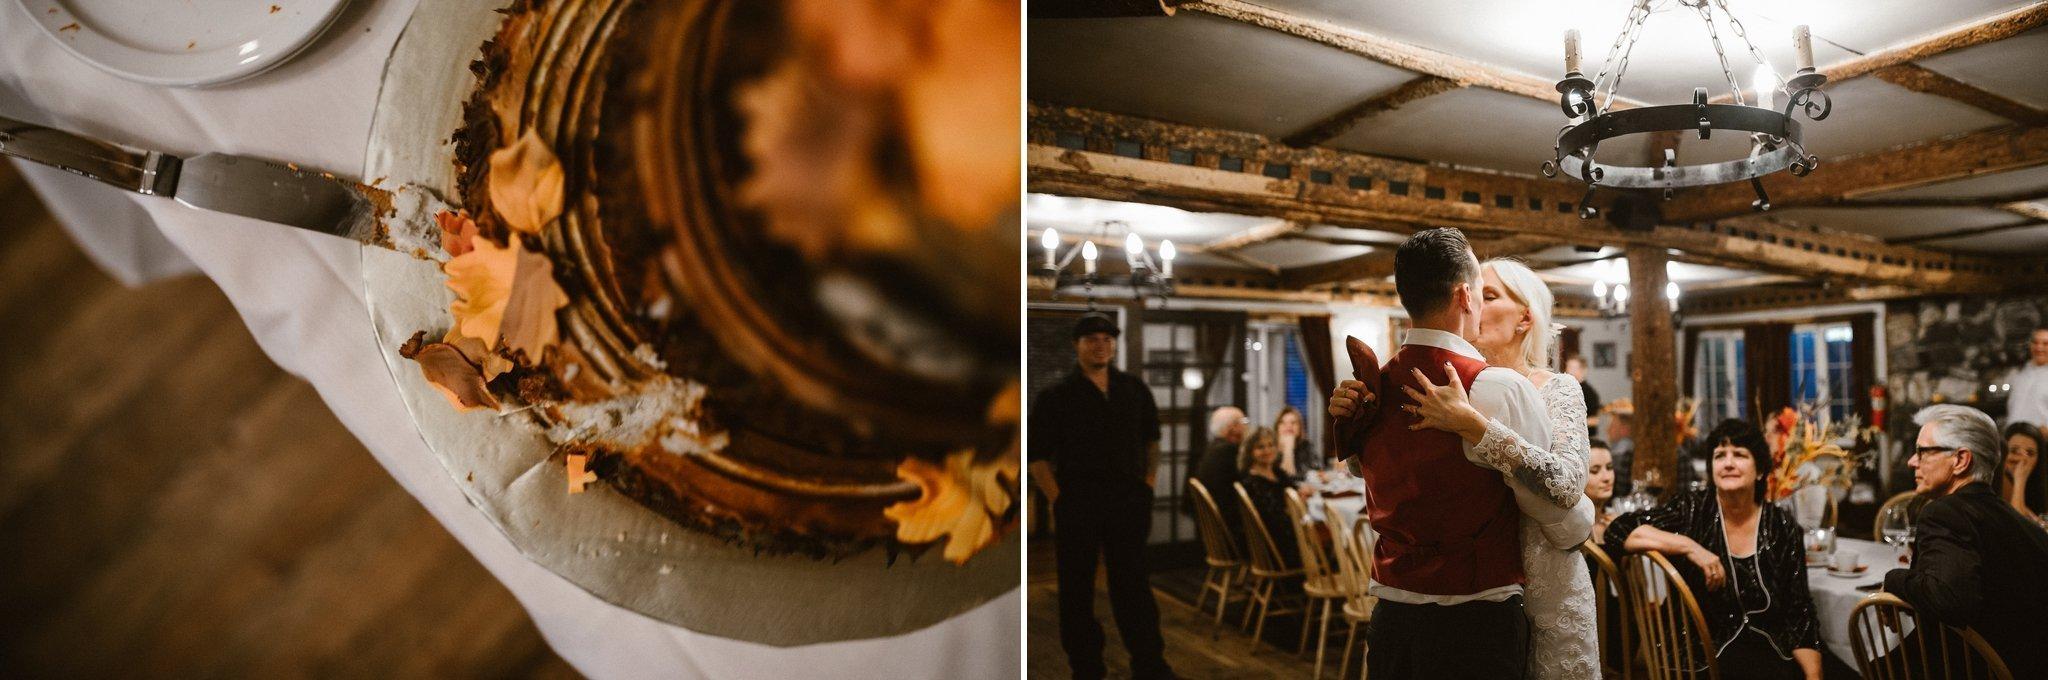 #weddingphotographer #coloradowedding #engaged #justengaged #howheasked #wereengaged #isaidyes #exploremore #thatsdarling #weddingplanning #colorado #destinationwedding #finditliveit #neverstopexploring #liveauthentic #lookslikefilm #socality #persuepretty #livefolk #destinationwedding #exploreeverything #bride #adventure #weddingdress #lifeofadventure #weddingplanning #isaidyes #weddingphotography #hprealweddings #elopement